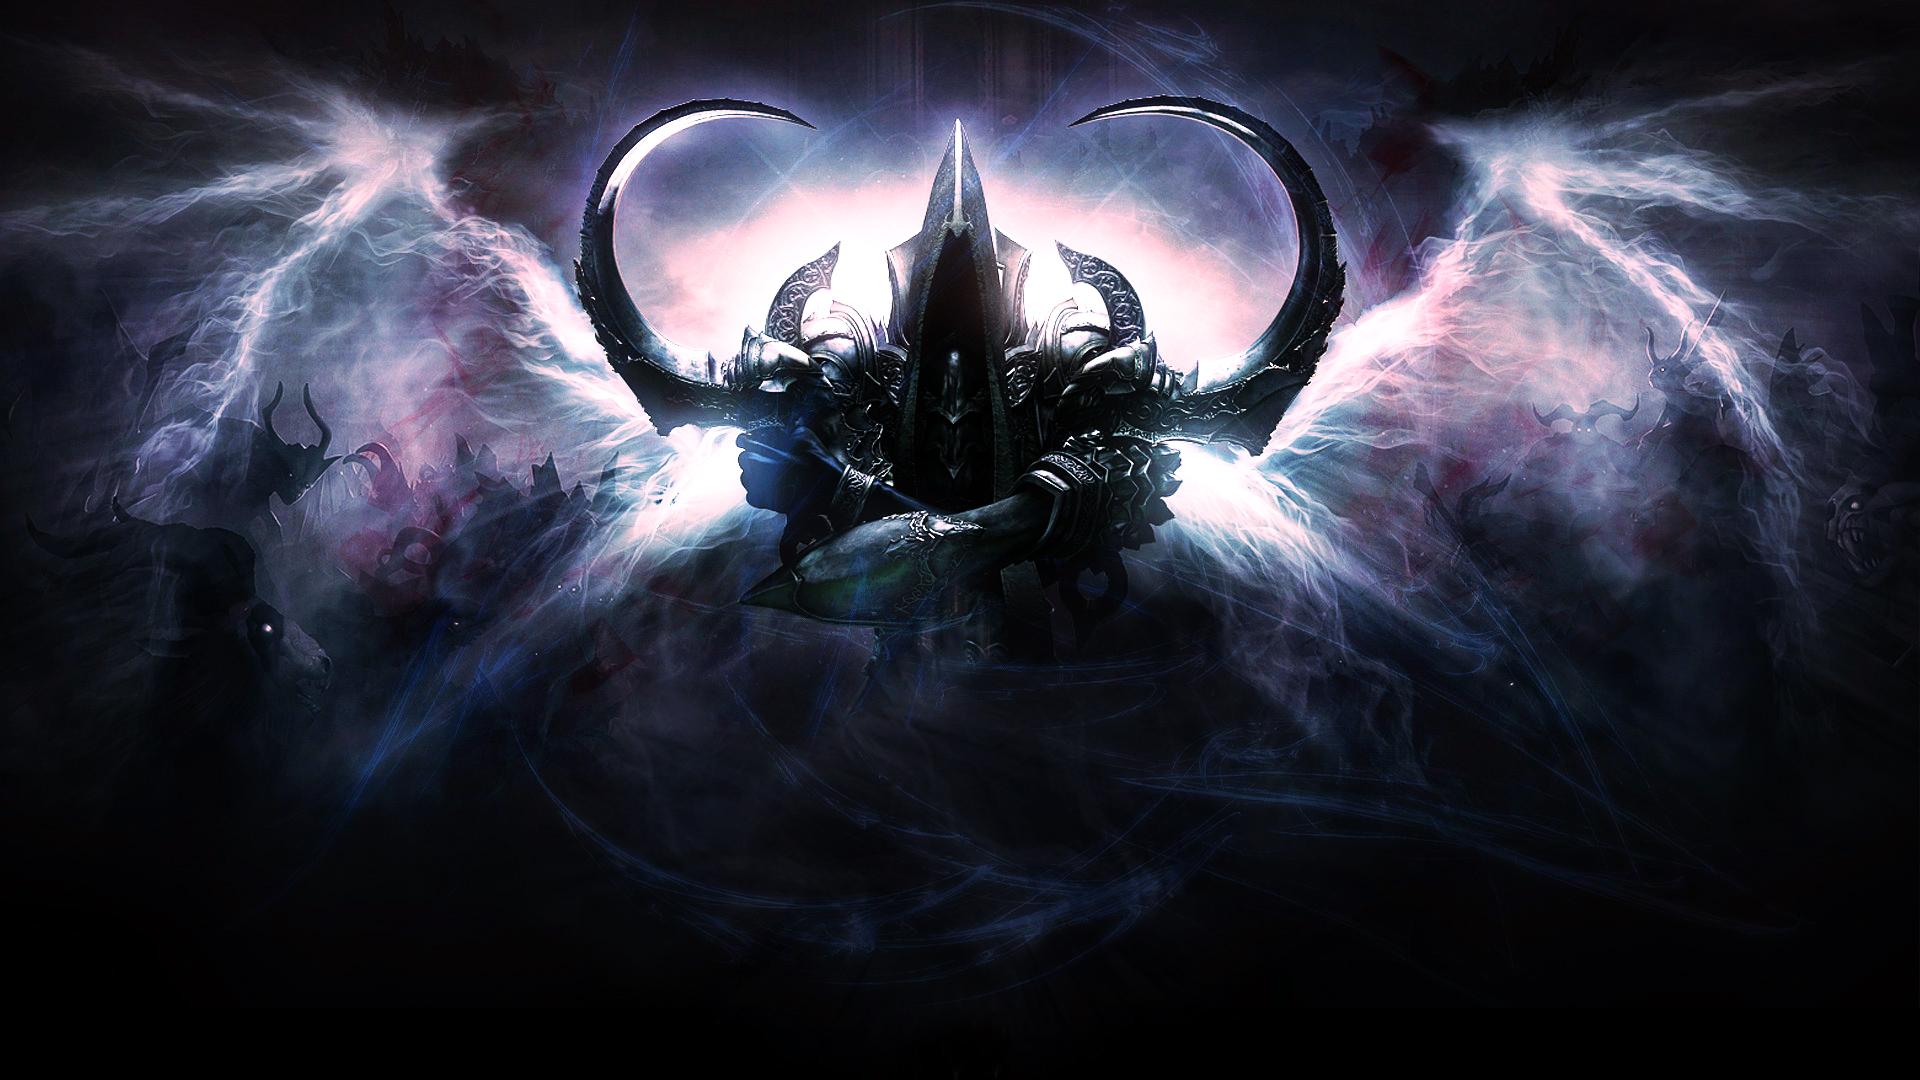 Diablo 3 - Reaper of Souls Wallpaper by NIHILUSDESIGNS on ...